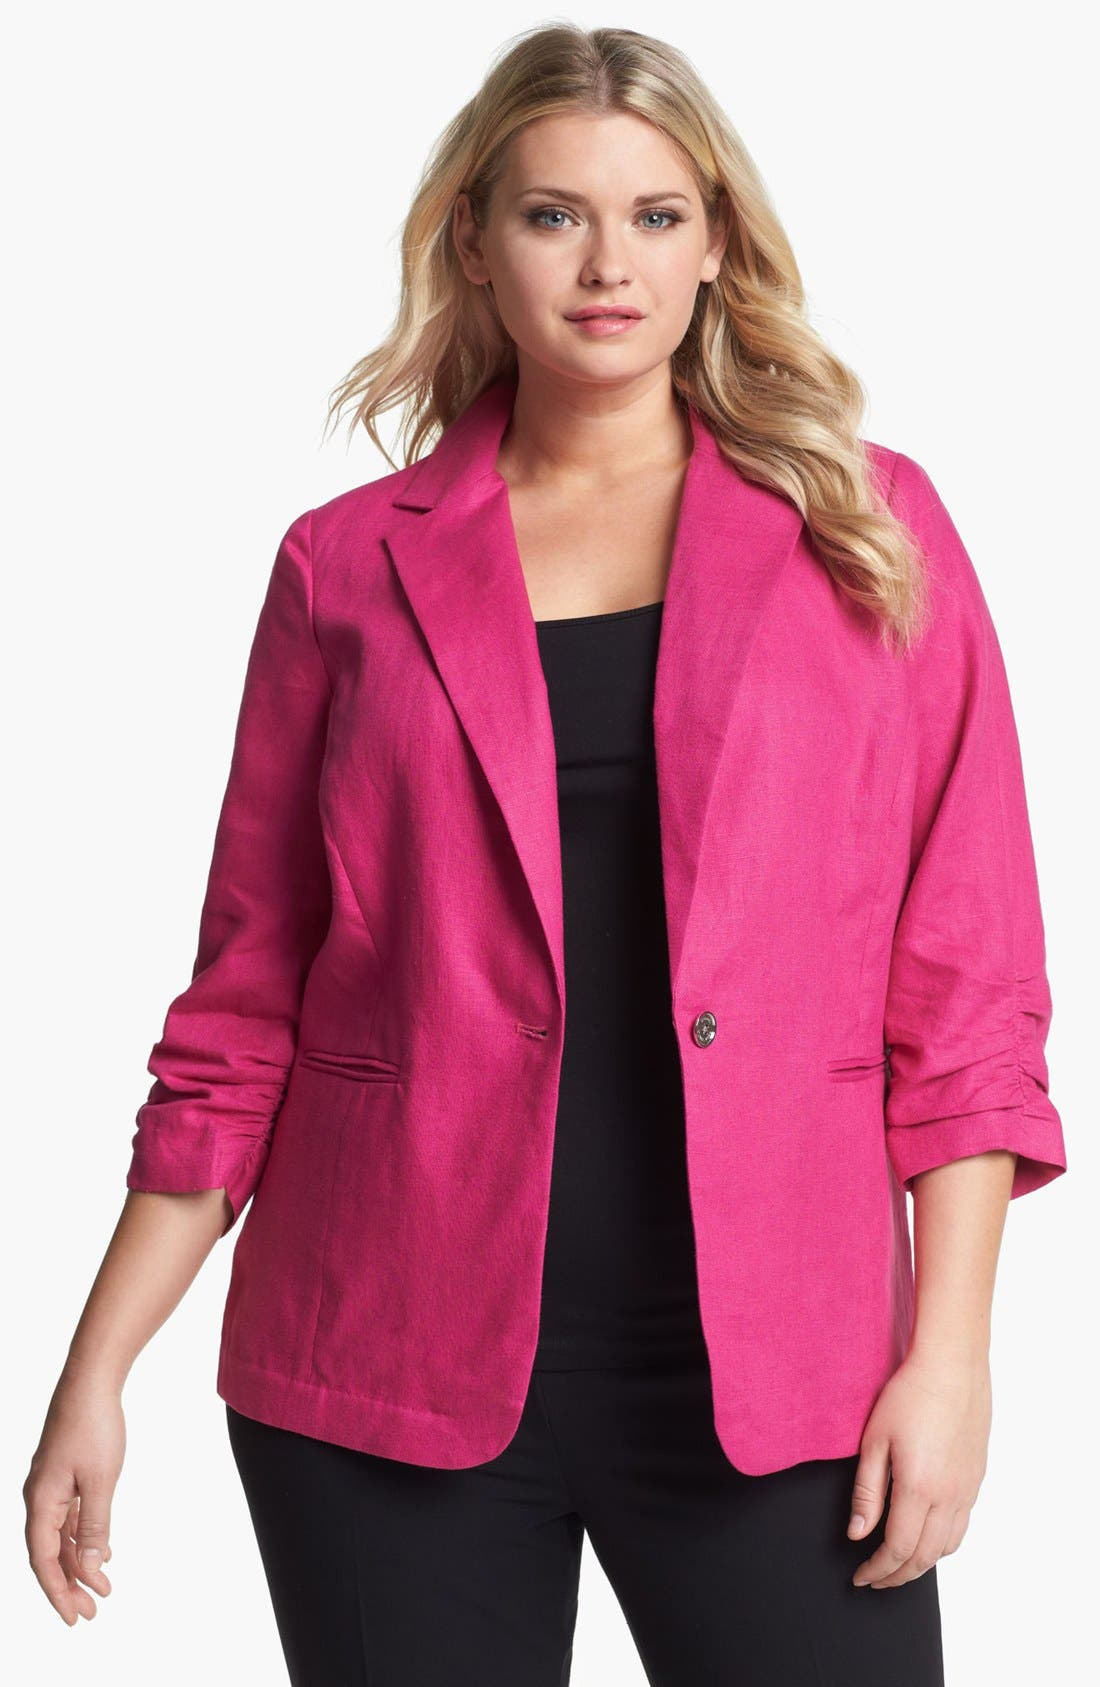 Alternate Image 1 Selected - MICHAEL Michael Kors Shirred Linen Jacket (Plus)